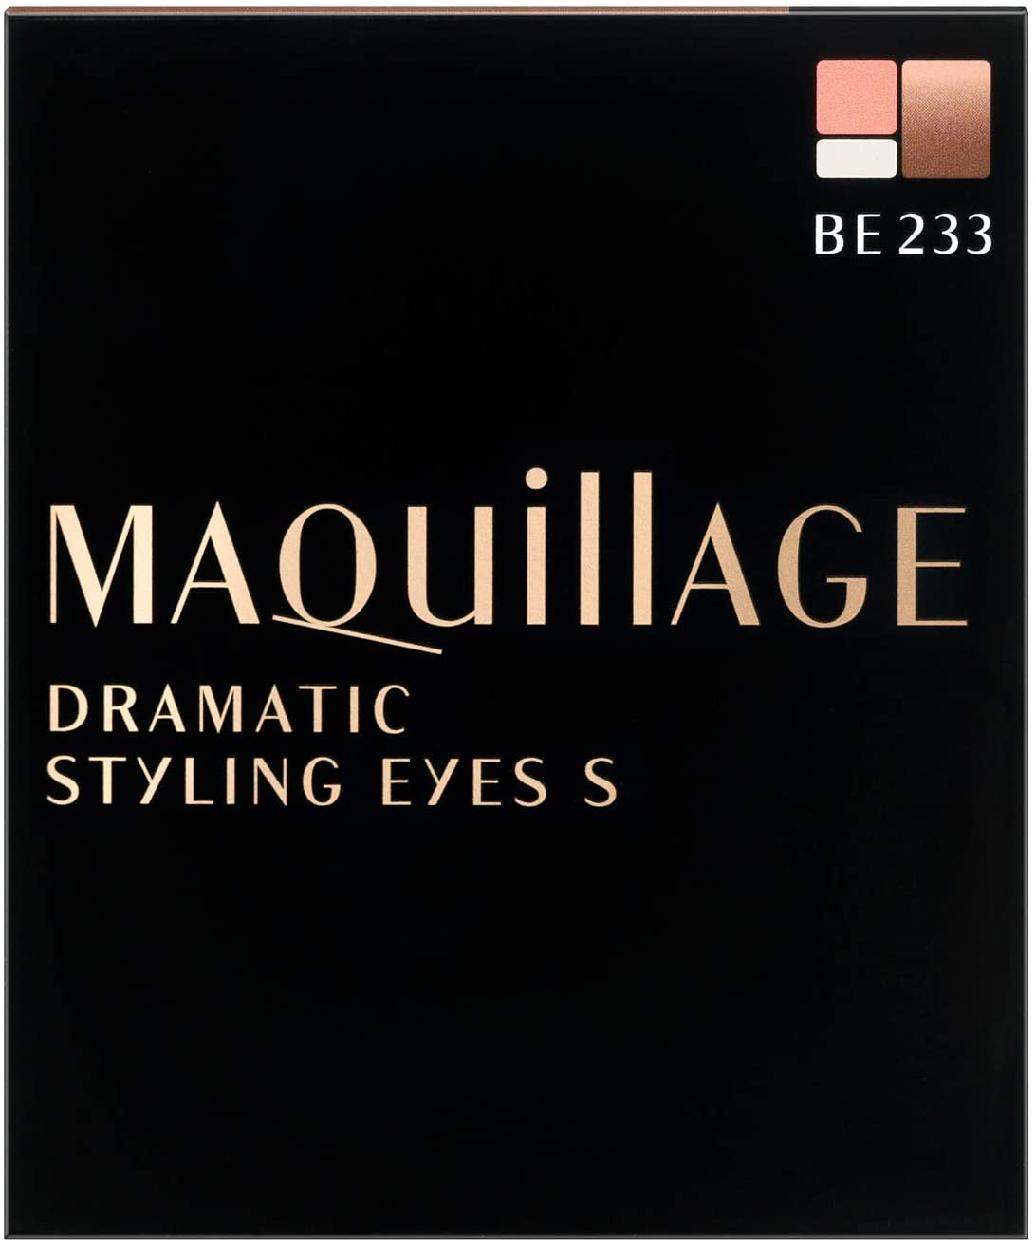 MAQuillAGE(マキアージュ)ドラマティックスタイリングアイズSの商品画像2